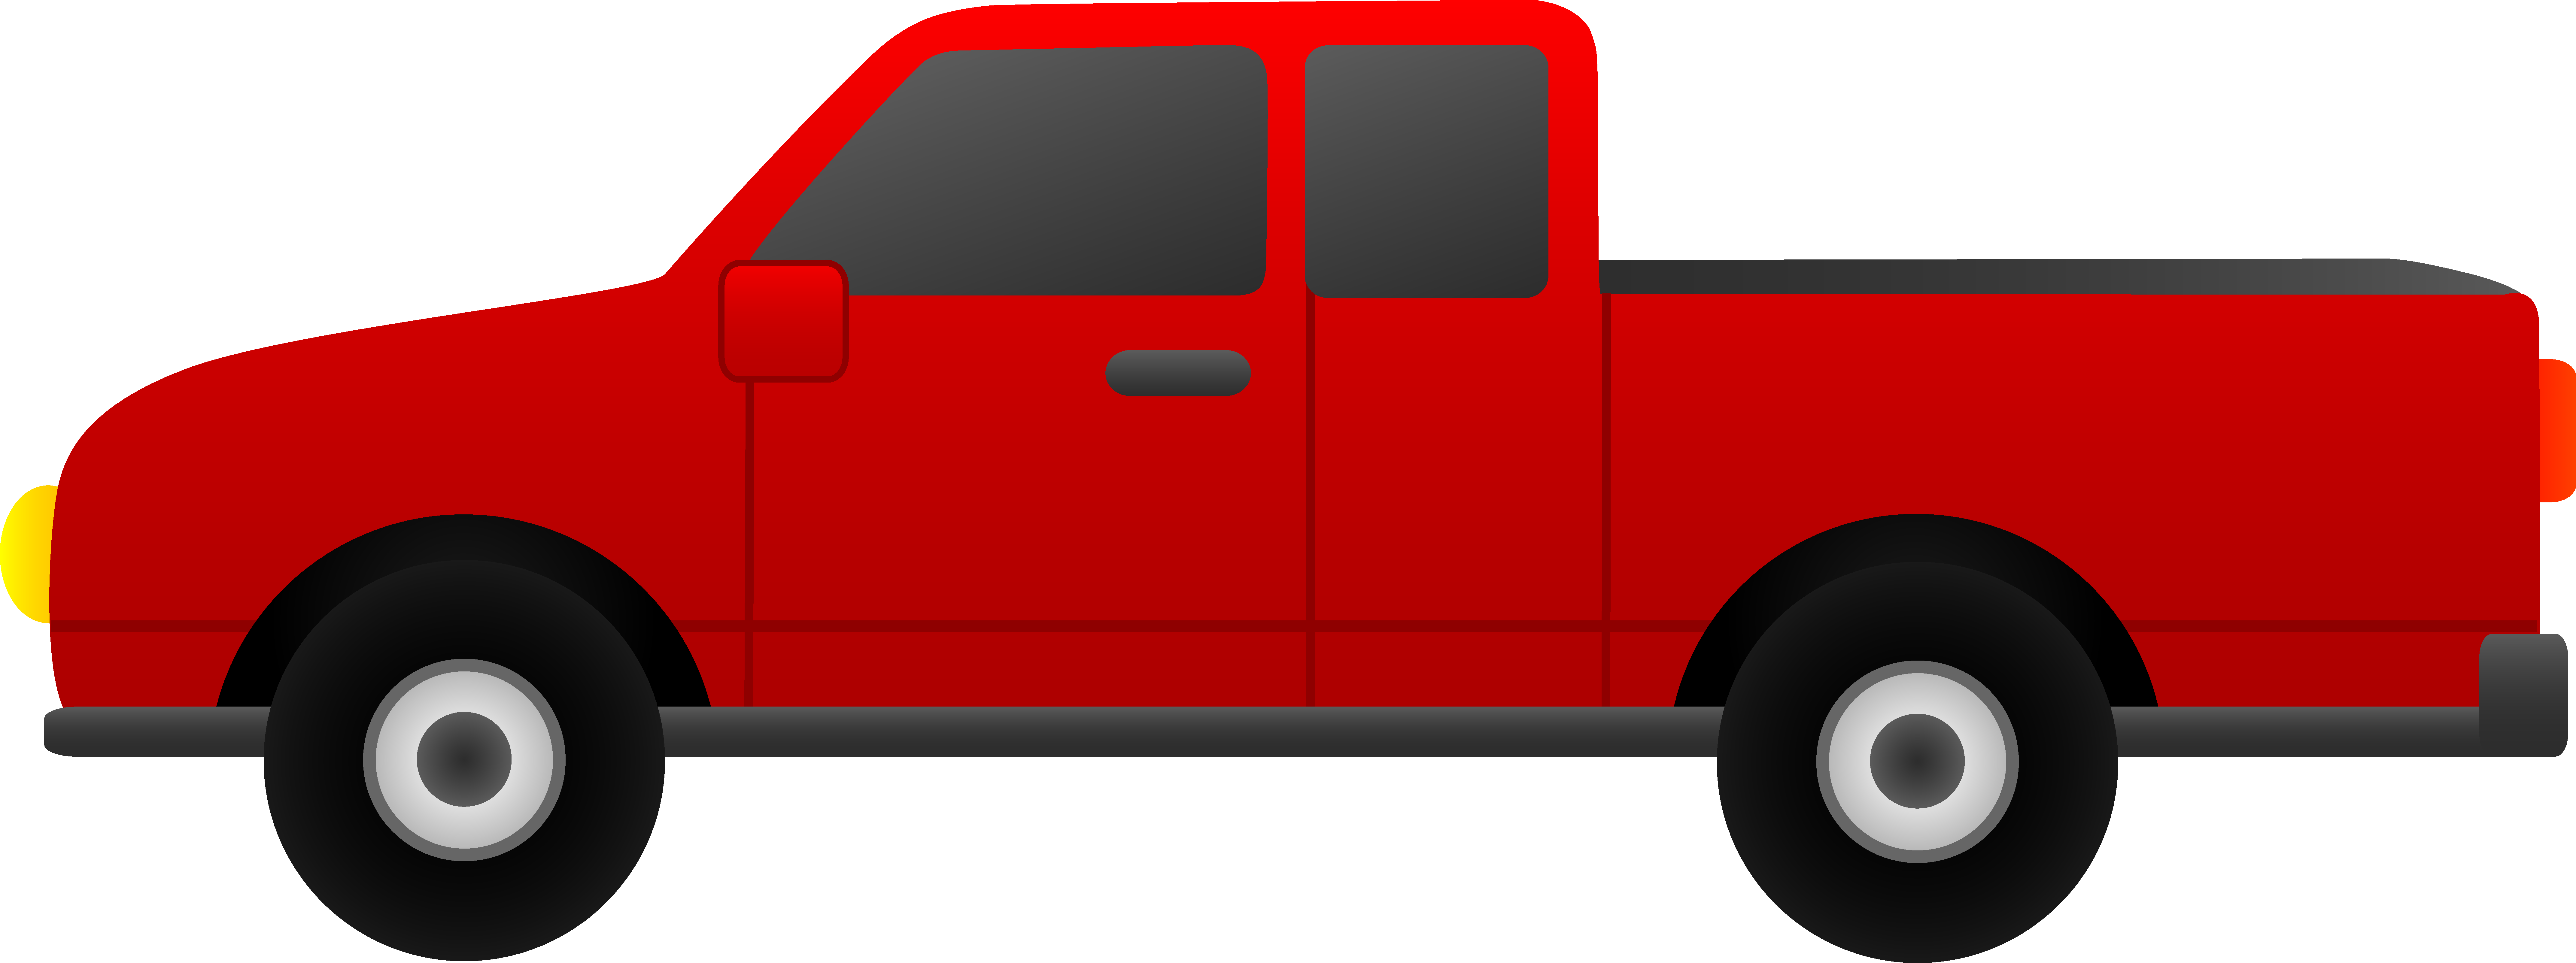 8576x3207 Red Pickup Truck Clip Art